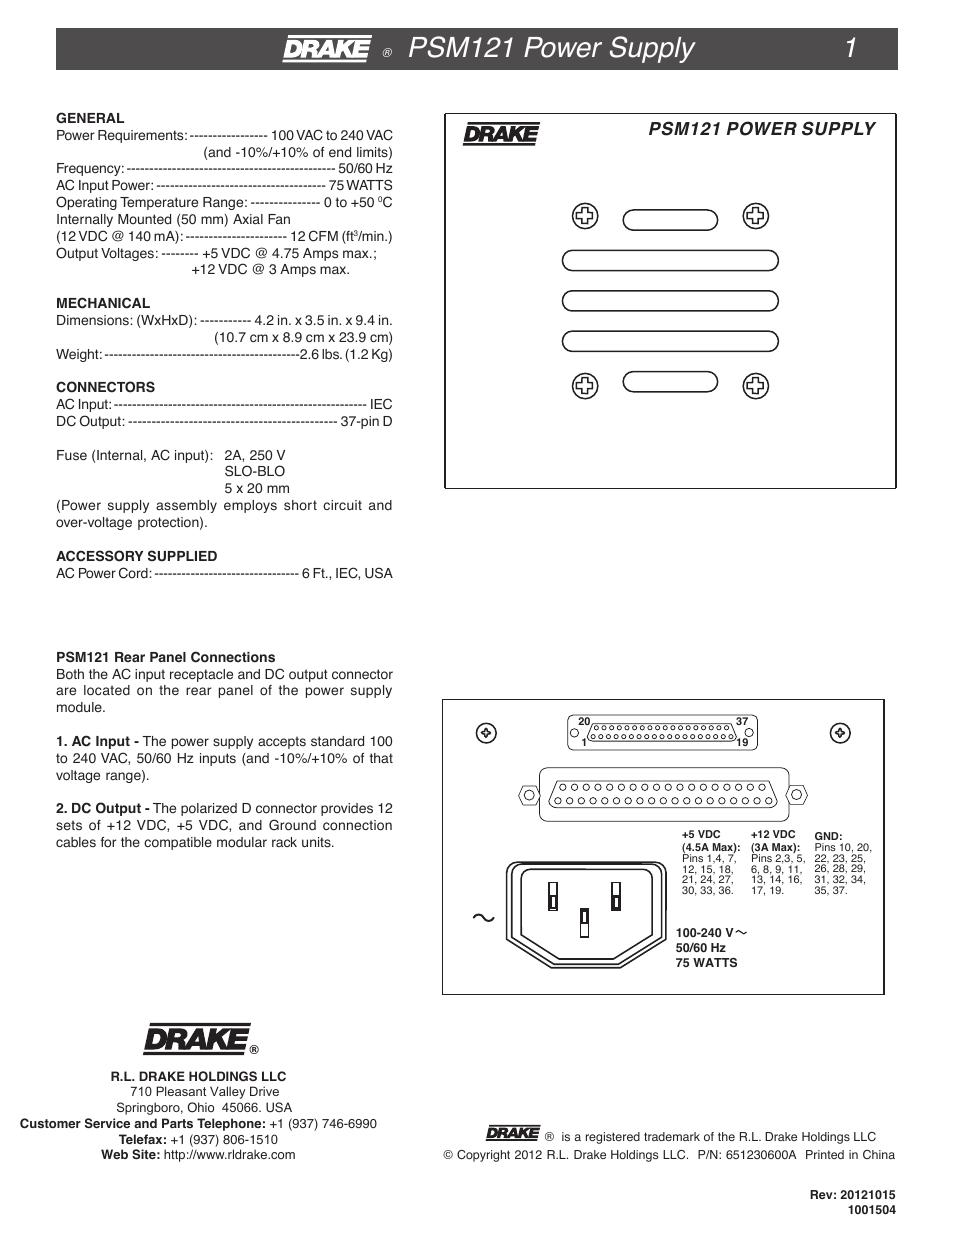 Drake PSM121 User Manual   2 pages